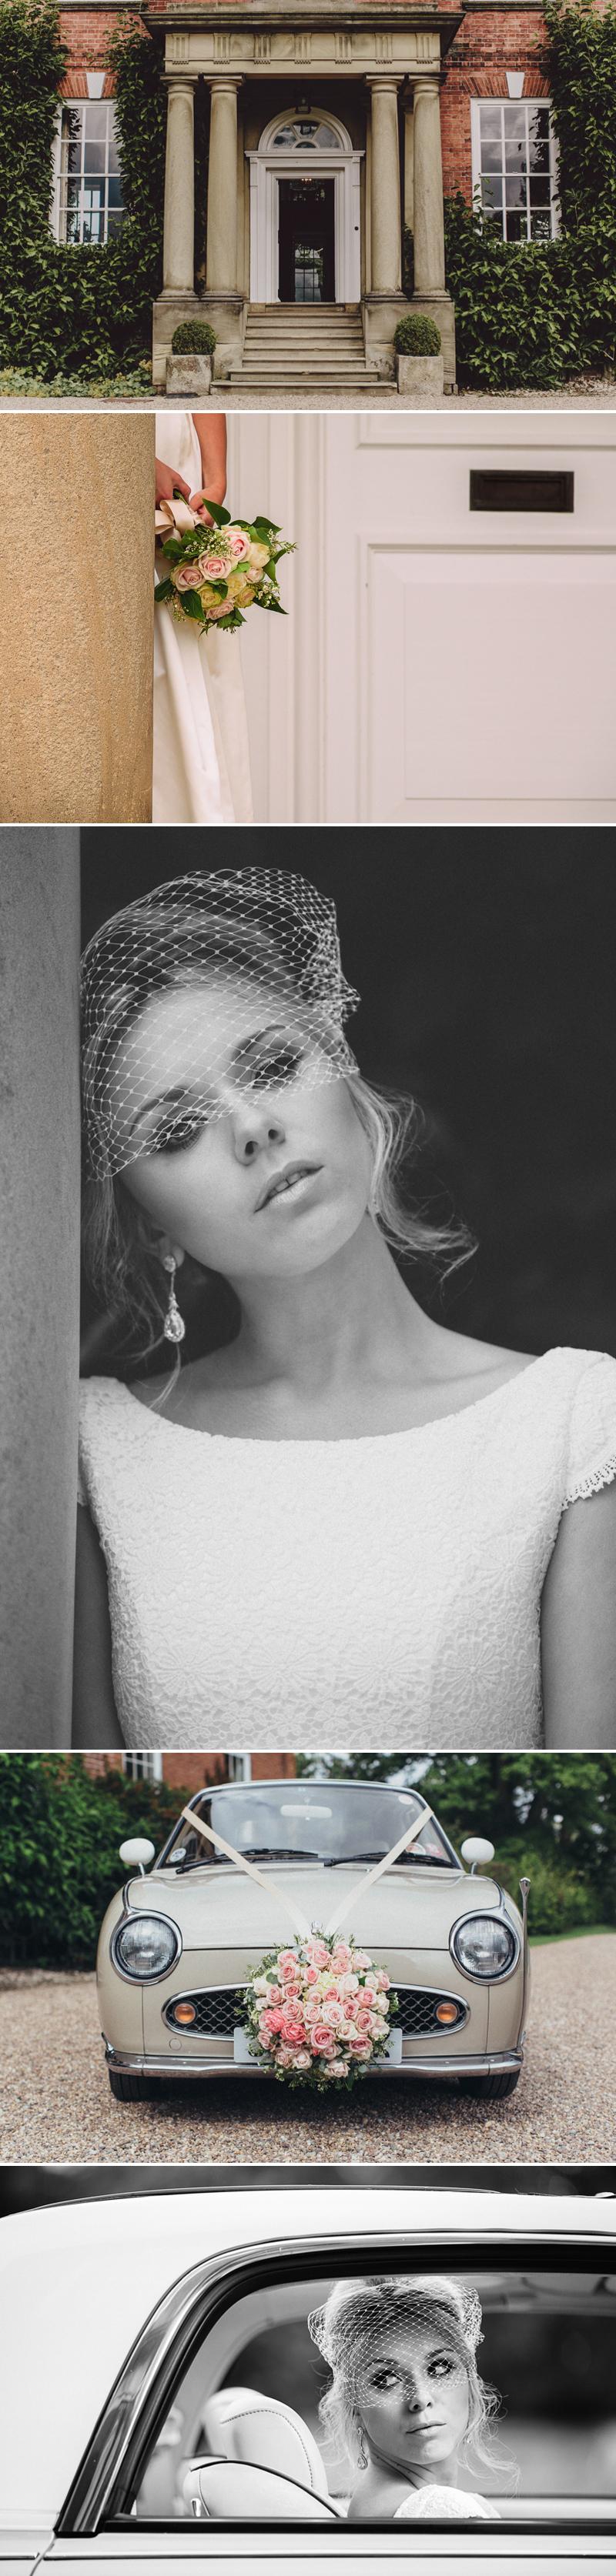 modern-vintage-bridal-boudoir-shoot-iscoyd-park-la-jolie-mariee-coco-wedding-venues-katrina-otter-weddings-005